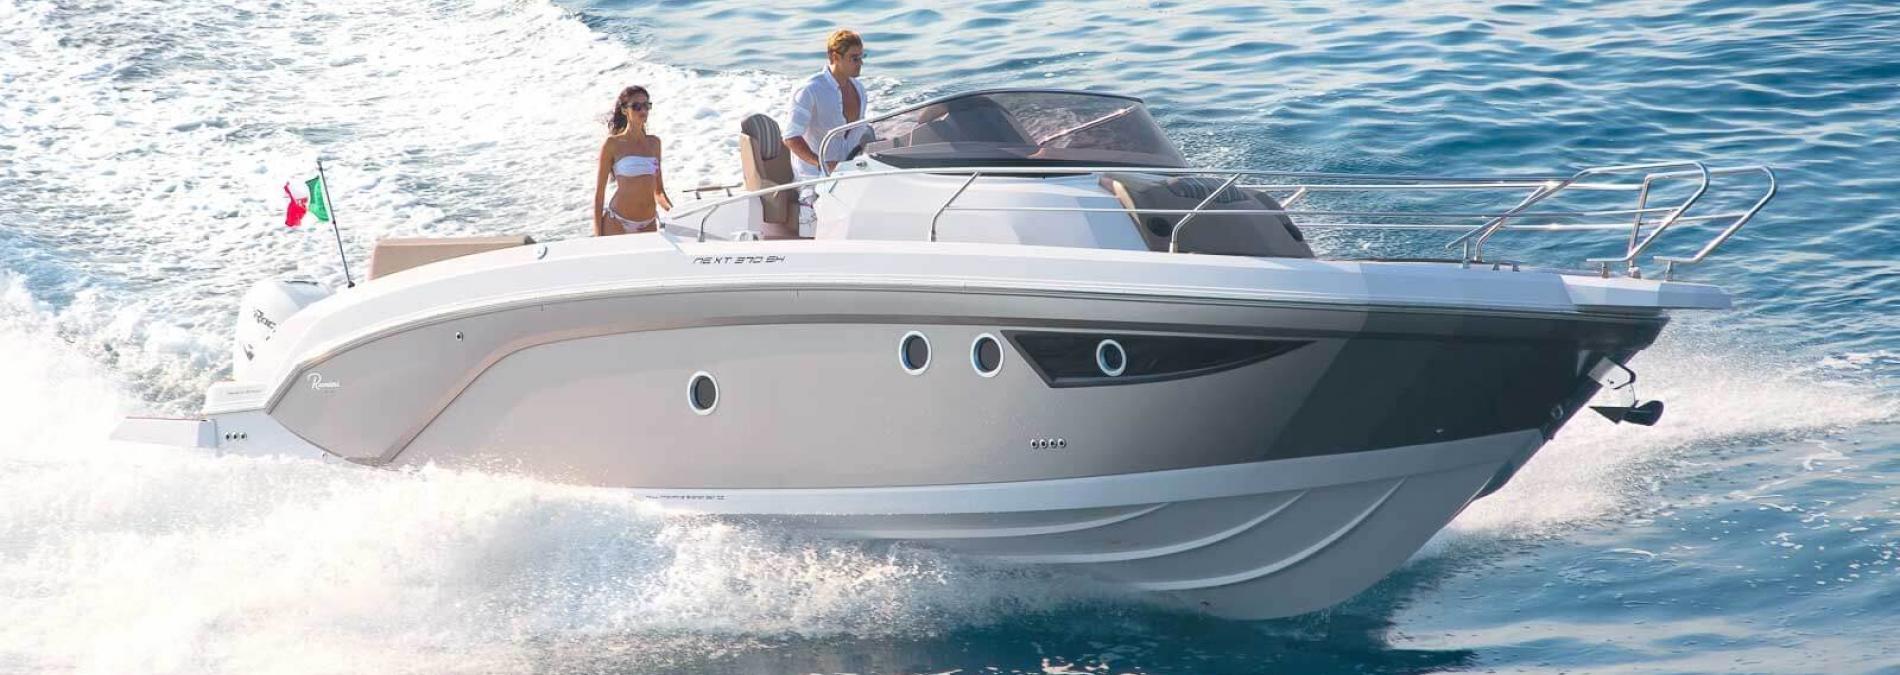 Ranieri boats rigid hull